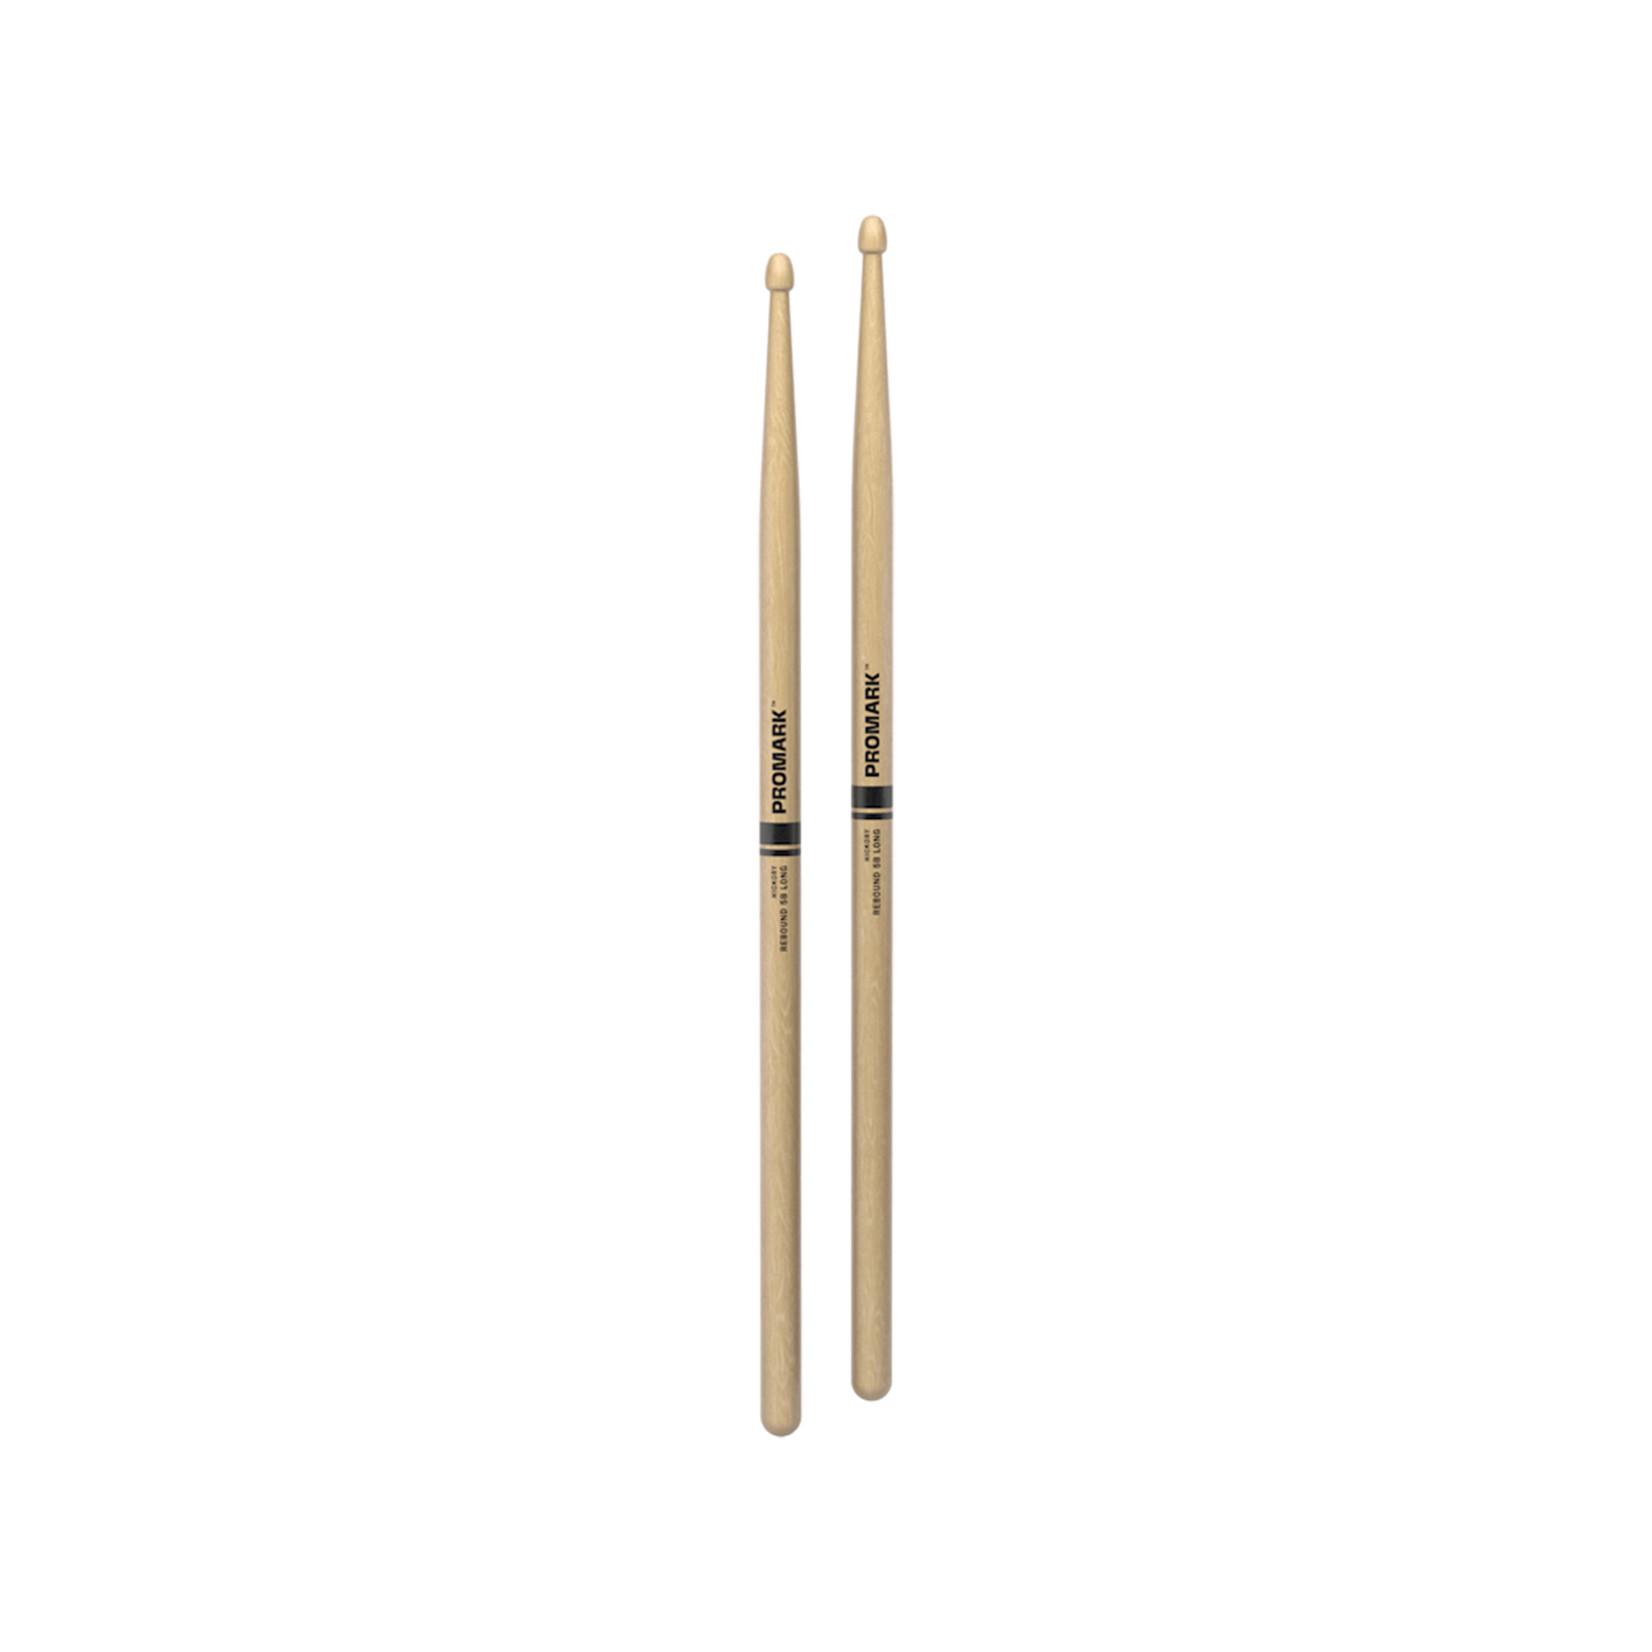 Promark ProMark Rebound 5B Long Hickory Acorn Wood Tip Drumstick